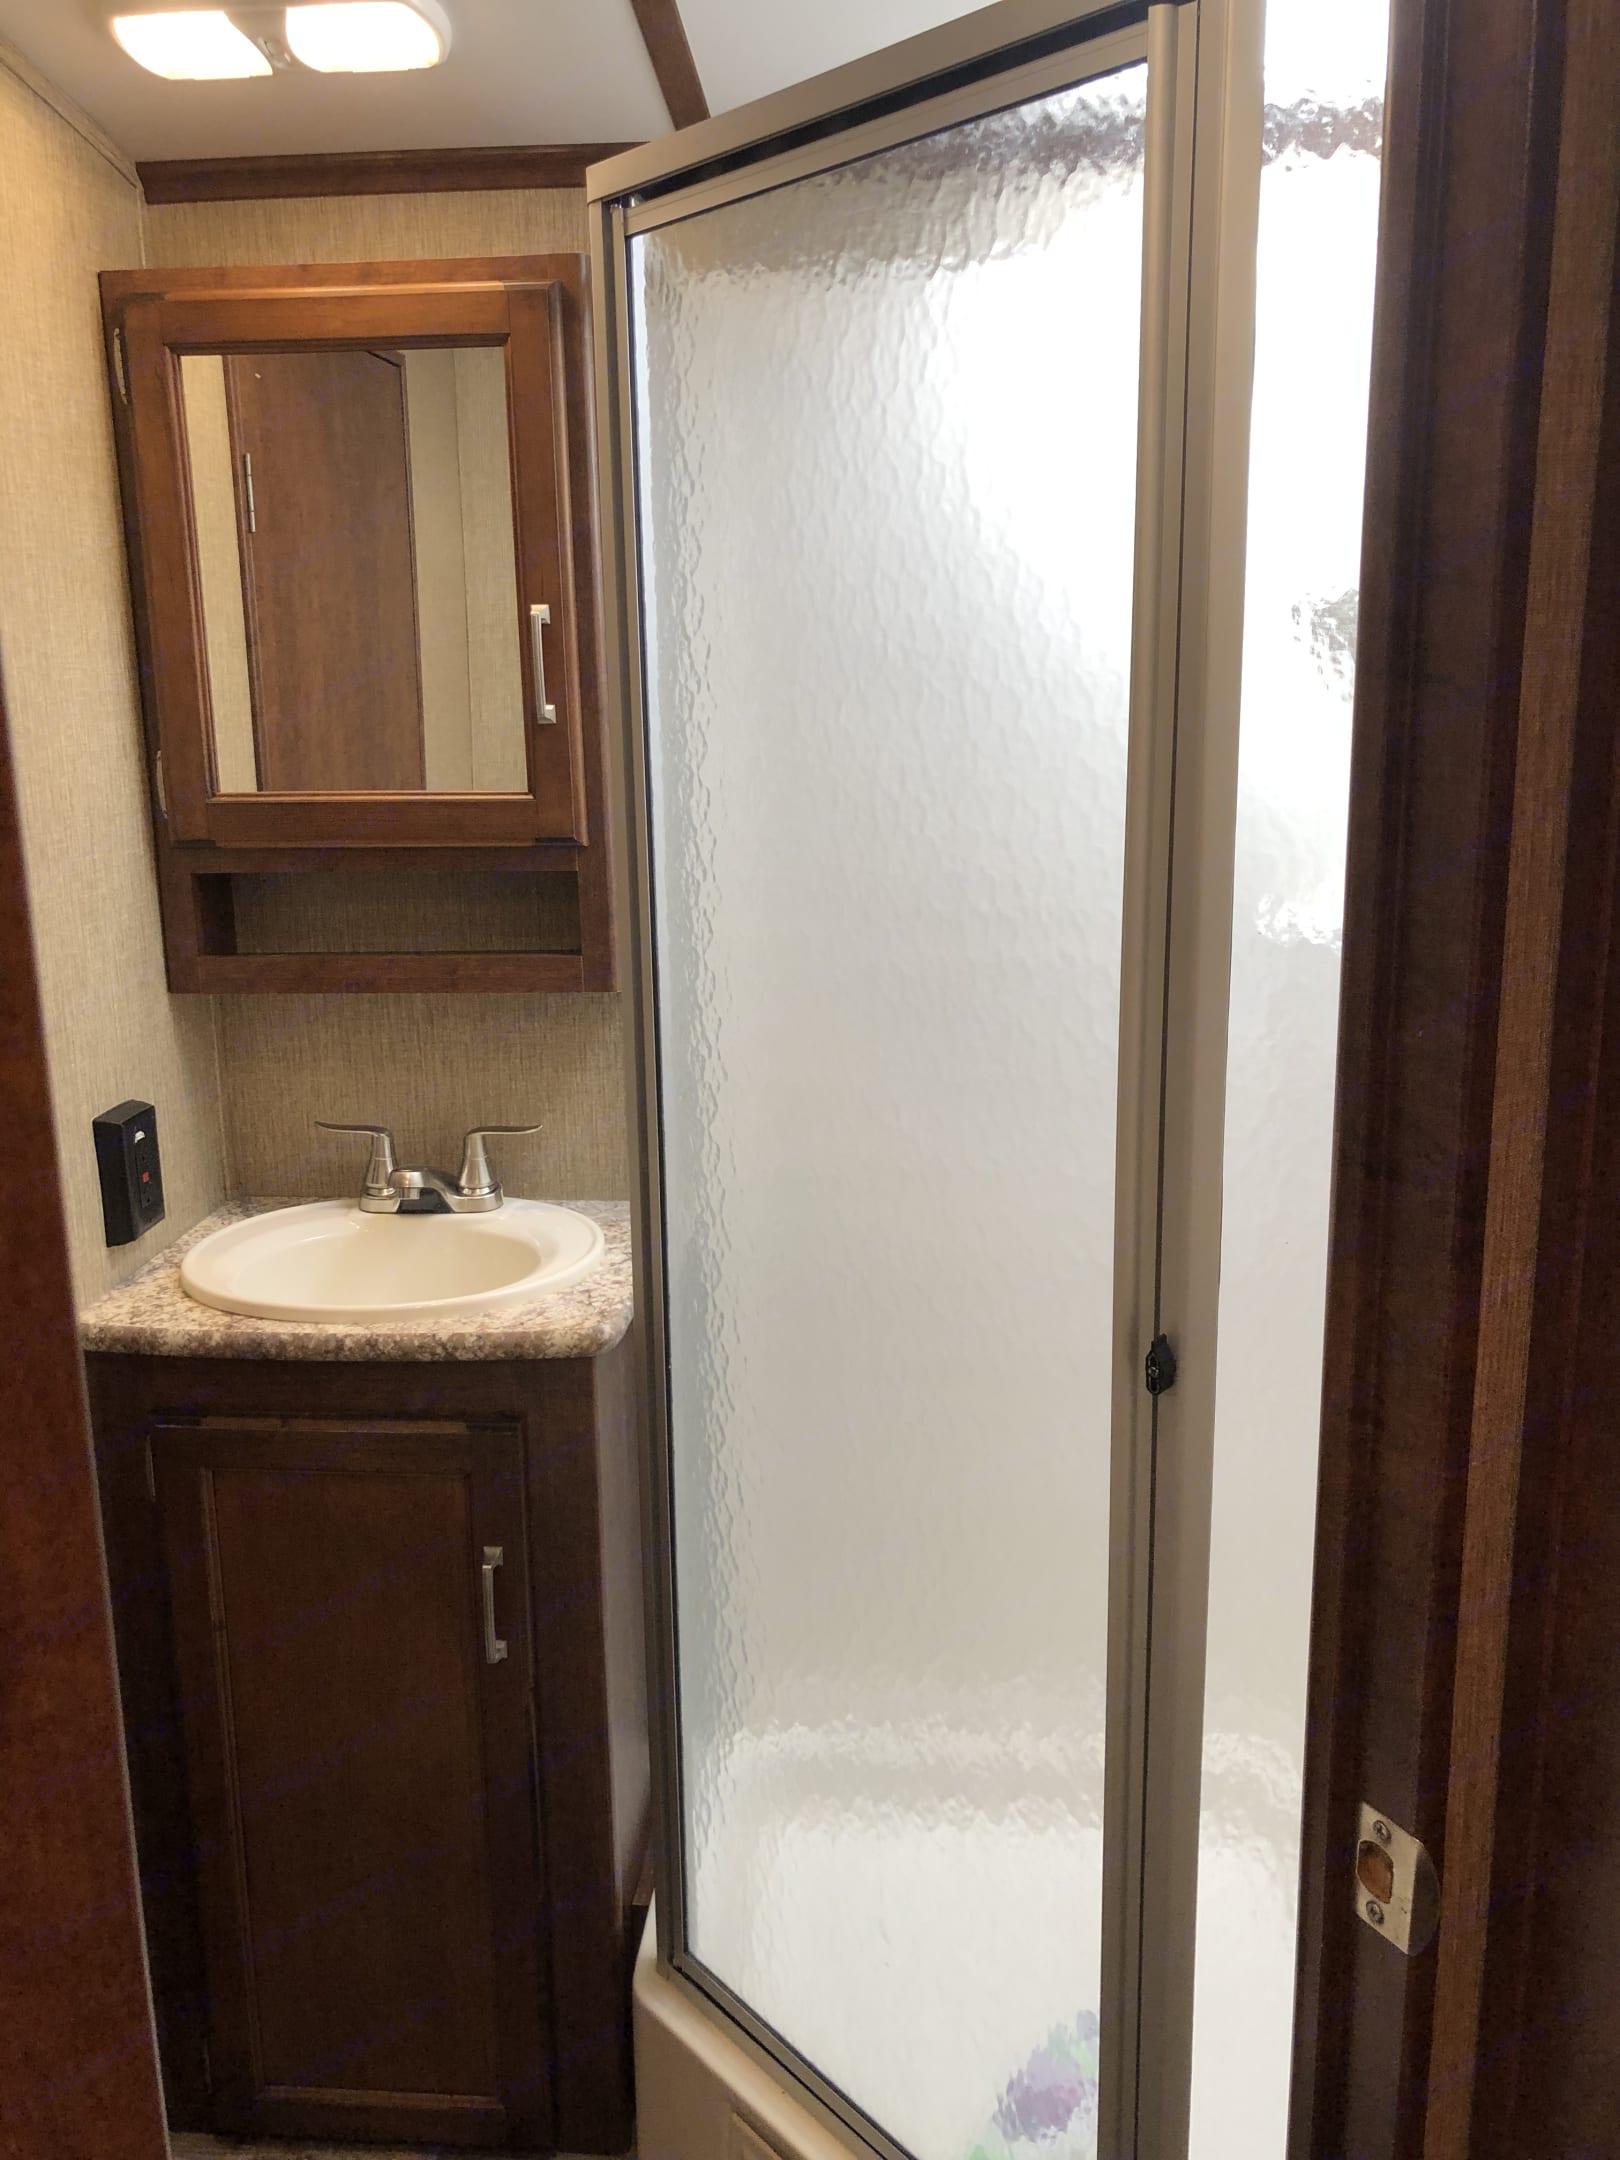 Trailer has one bathroom with shower.. Keystone Outback 2017